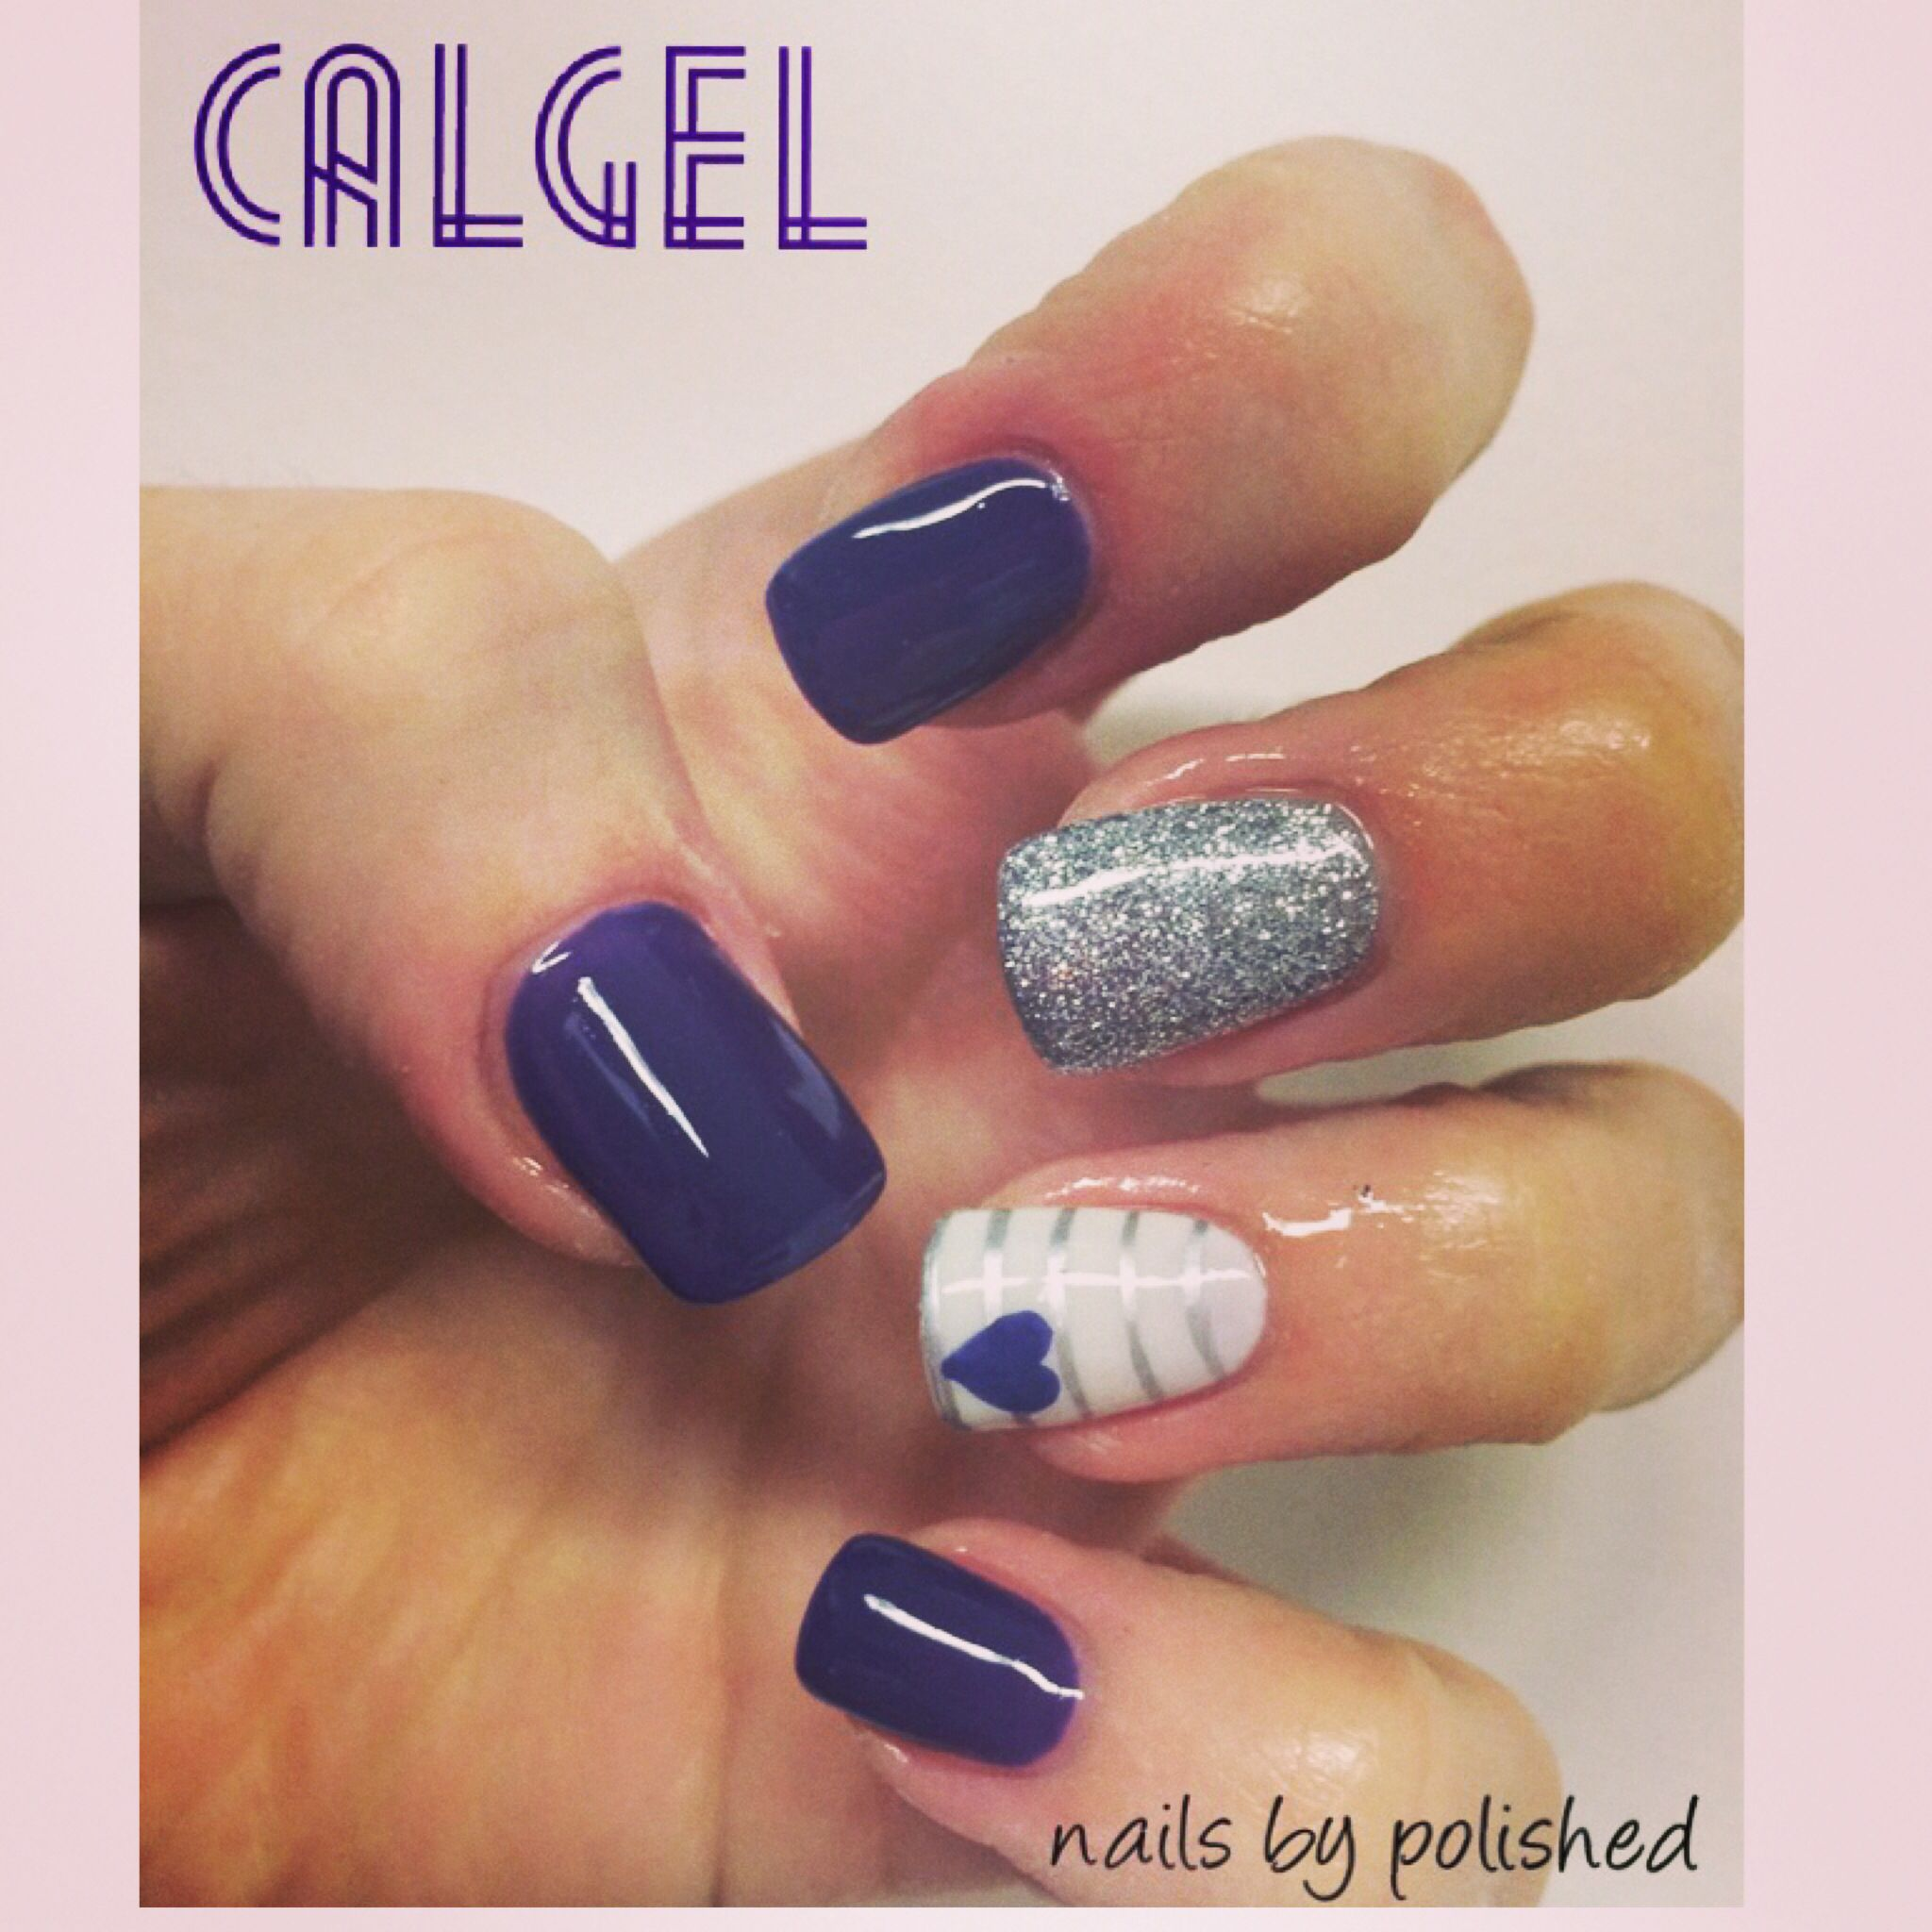 Cal Gel Nail: Calgel Nails By Polished